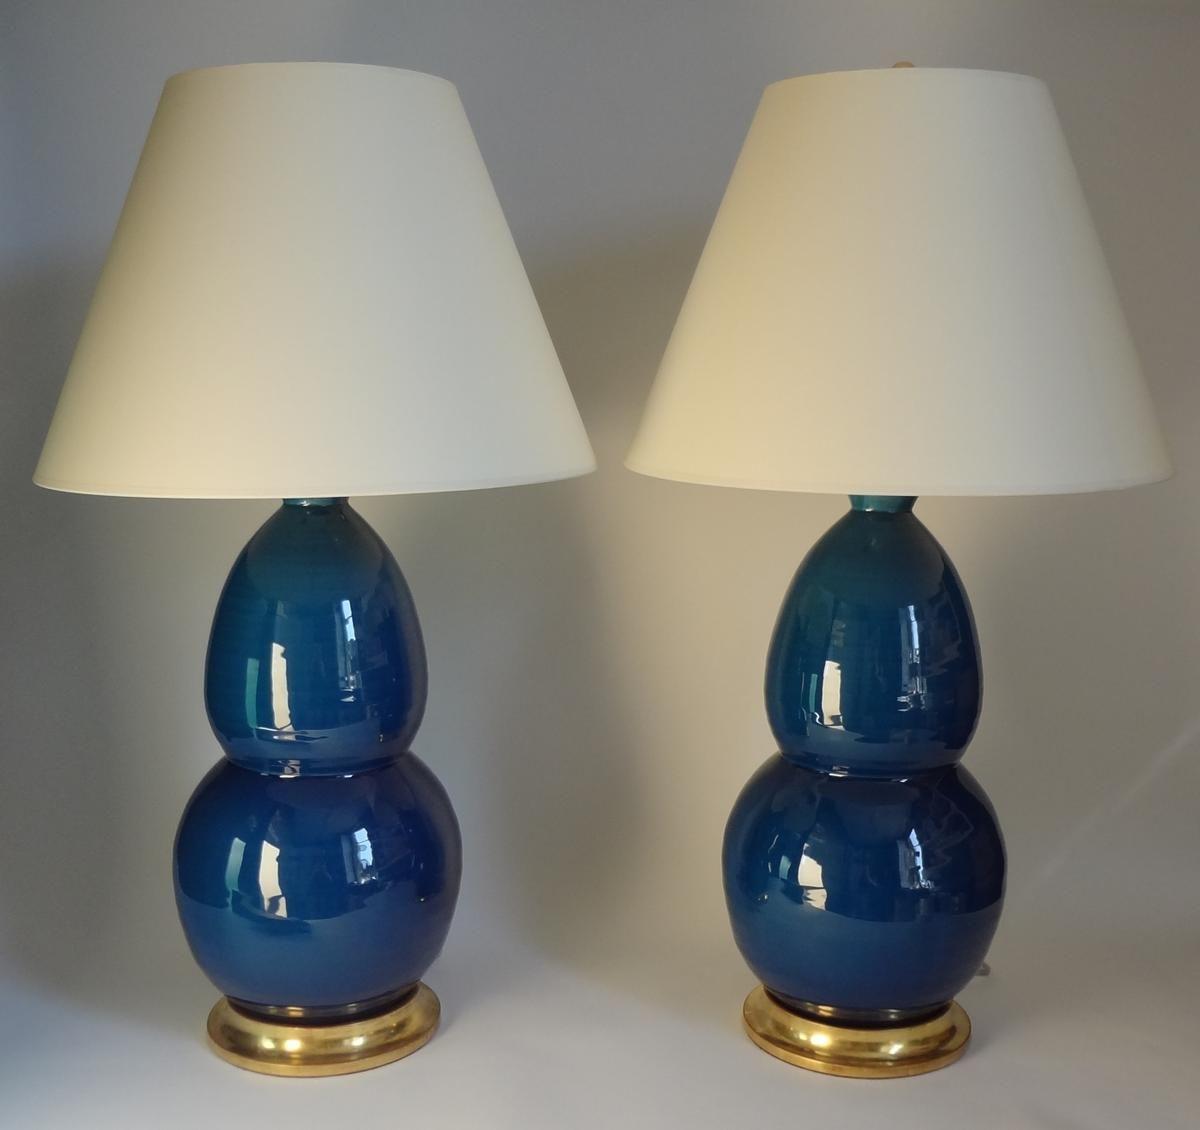 Christopher Spitzmiller Prussian Blue Modern Gourd